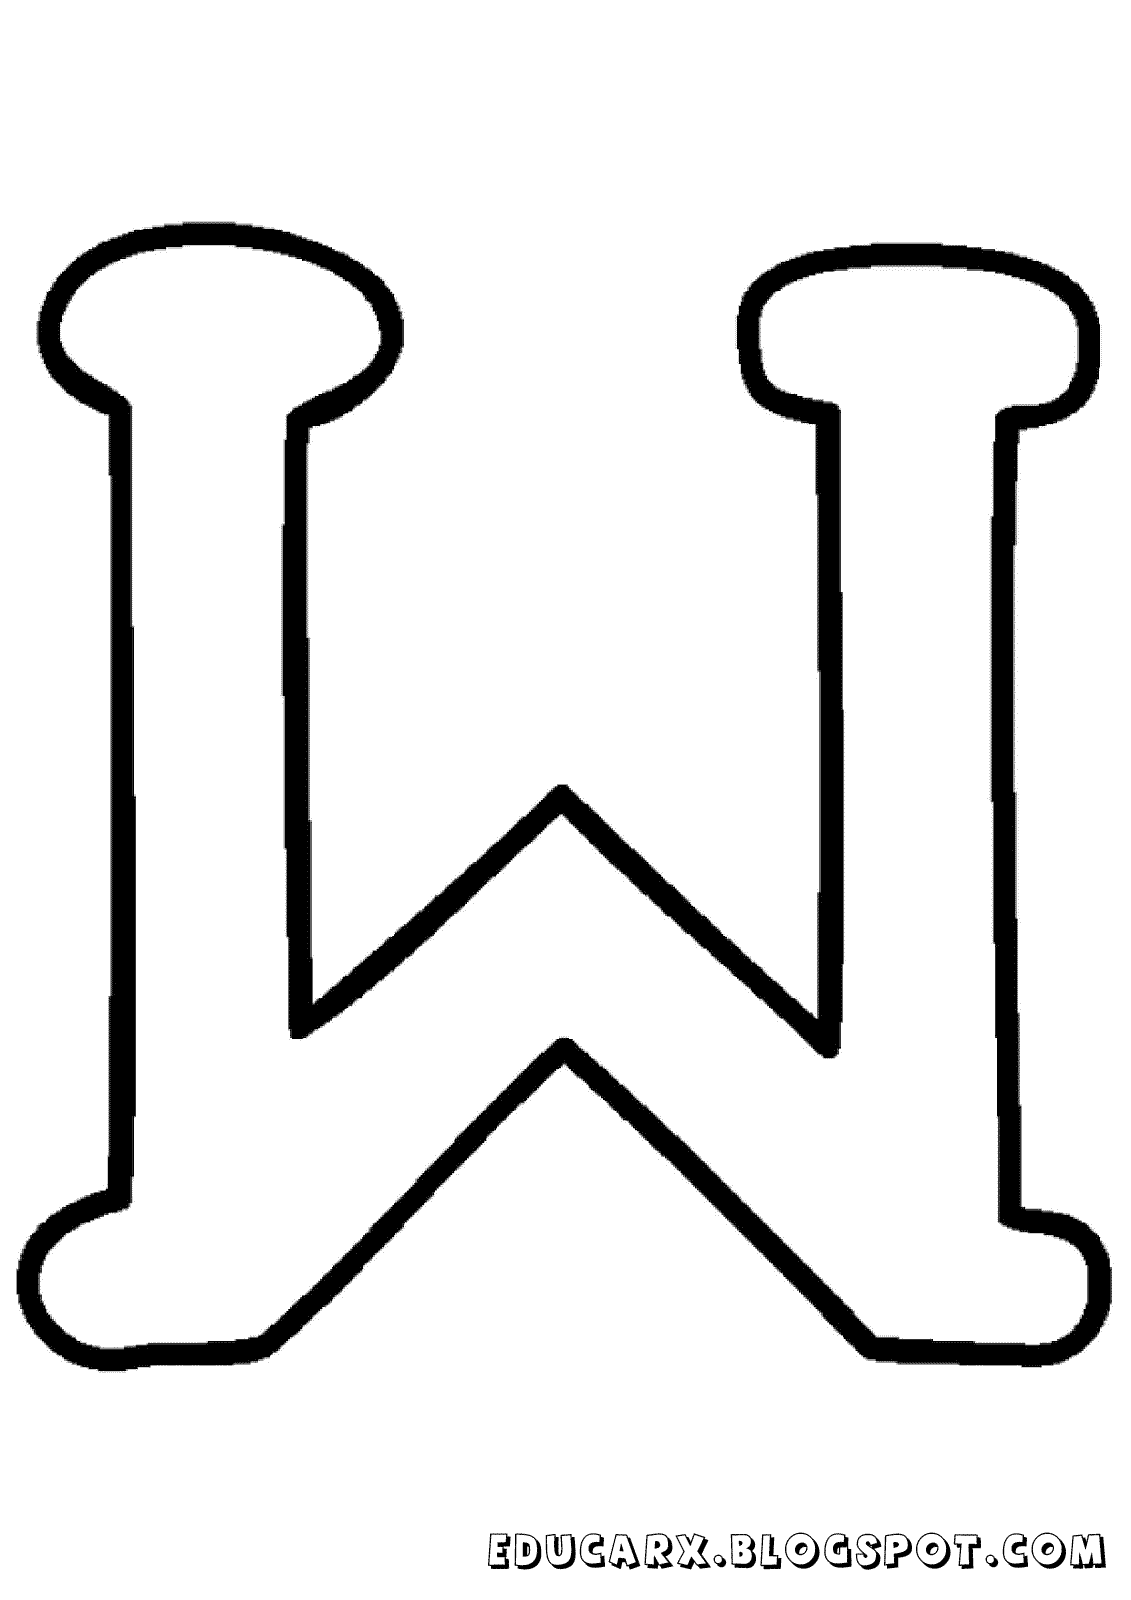 Molde da letra maiúscula W